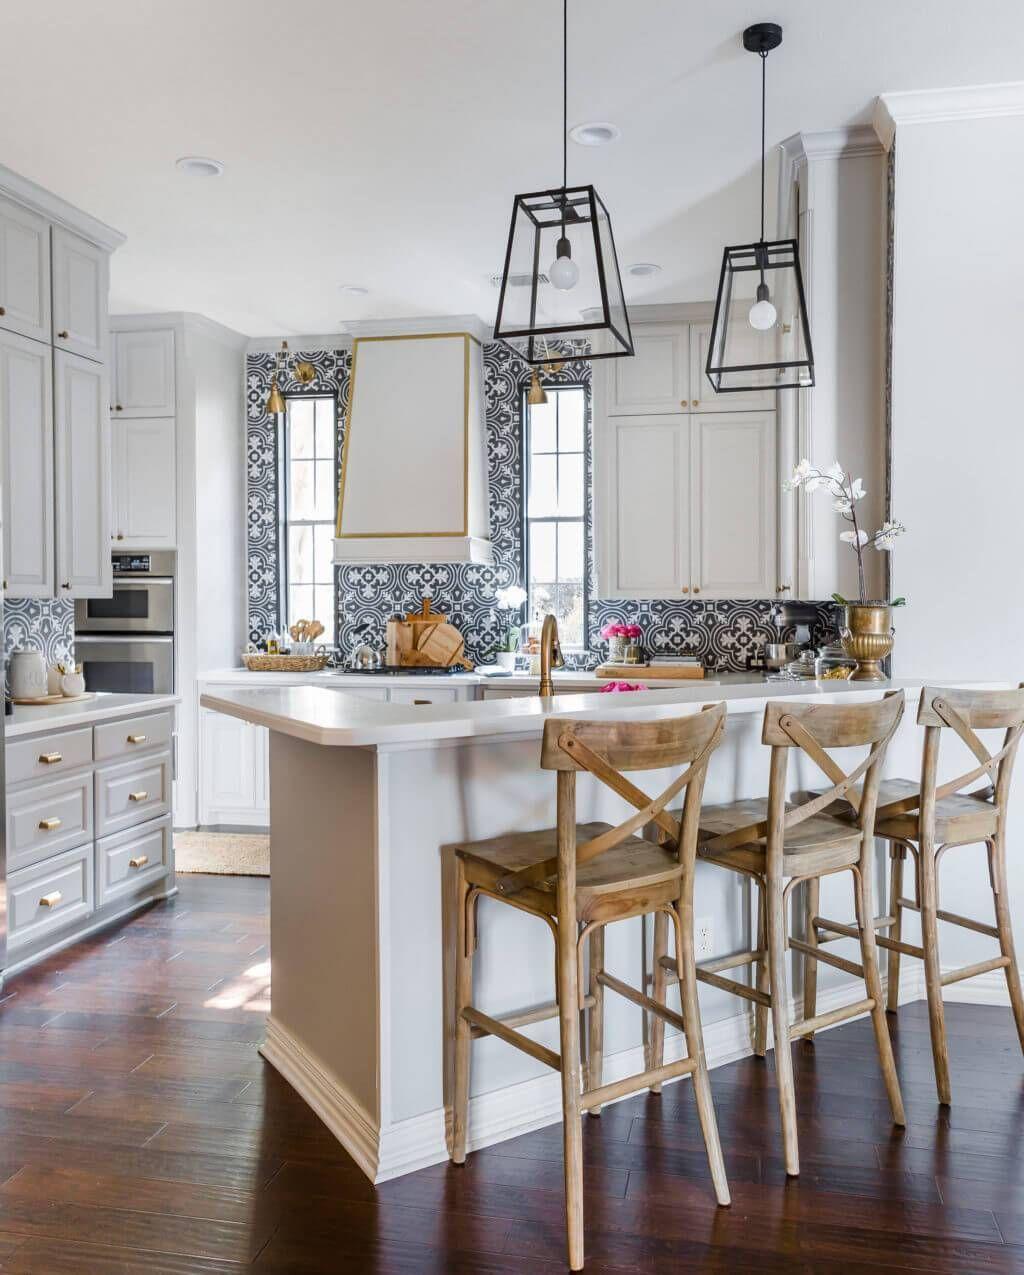 11 kitchen tile backsplash ideas for white cabinets that aren t rh pinterest com